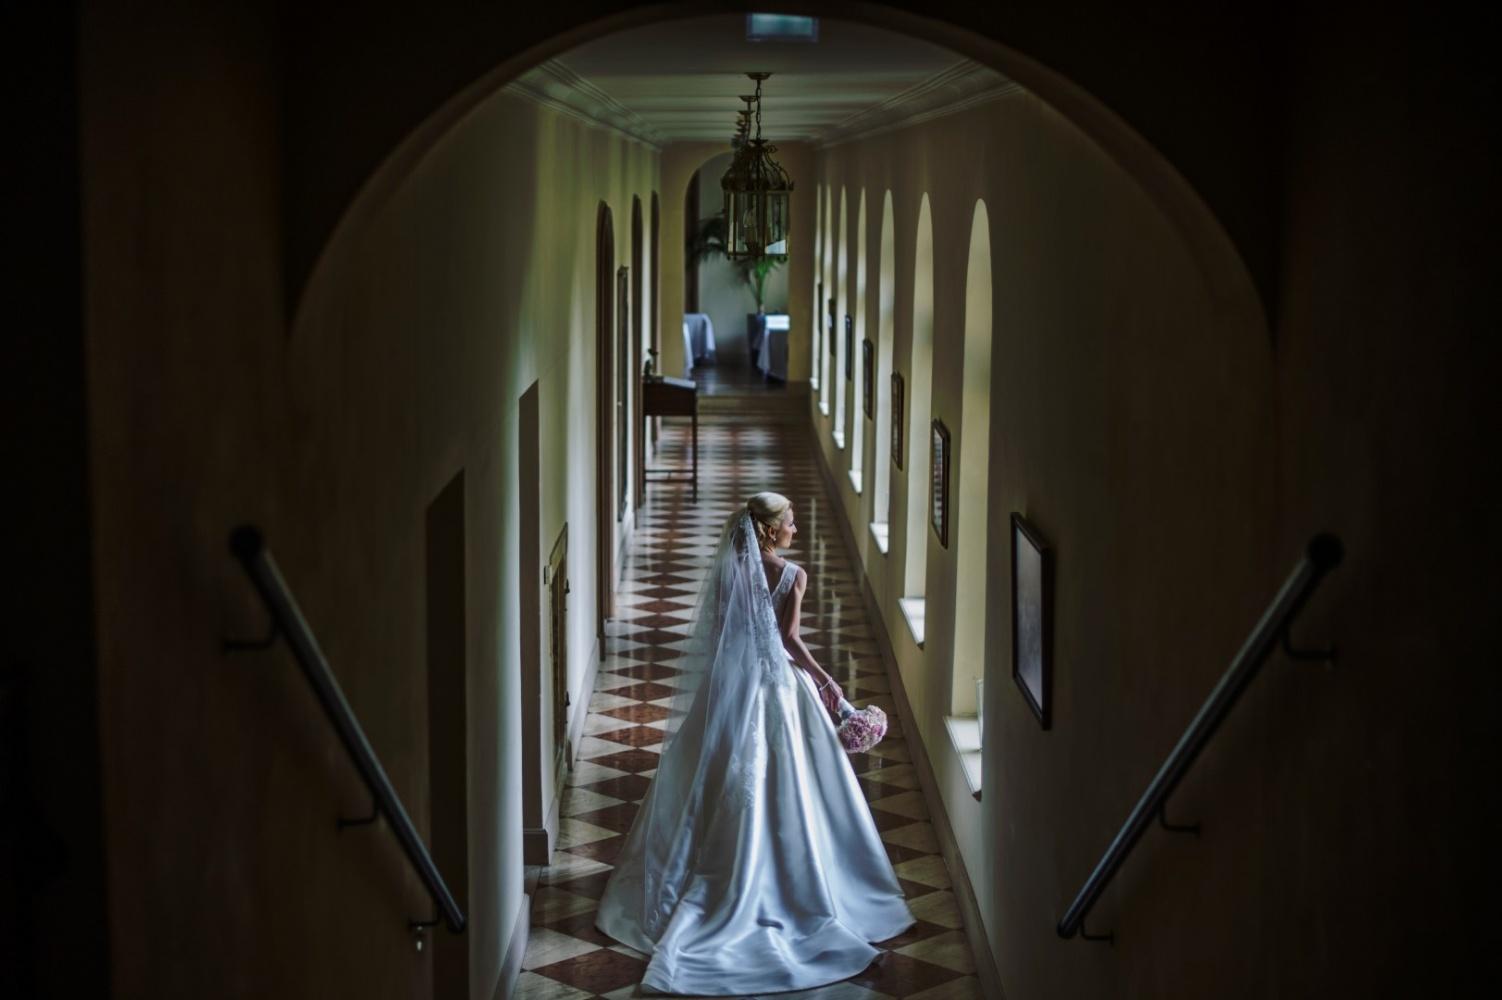 http://www.fotoz.sk/images/gallery-26/normal/svadba_hotel-chateau-bela_002.jpg